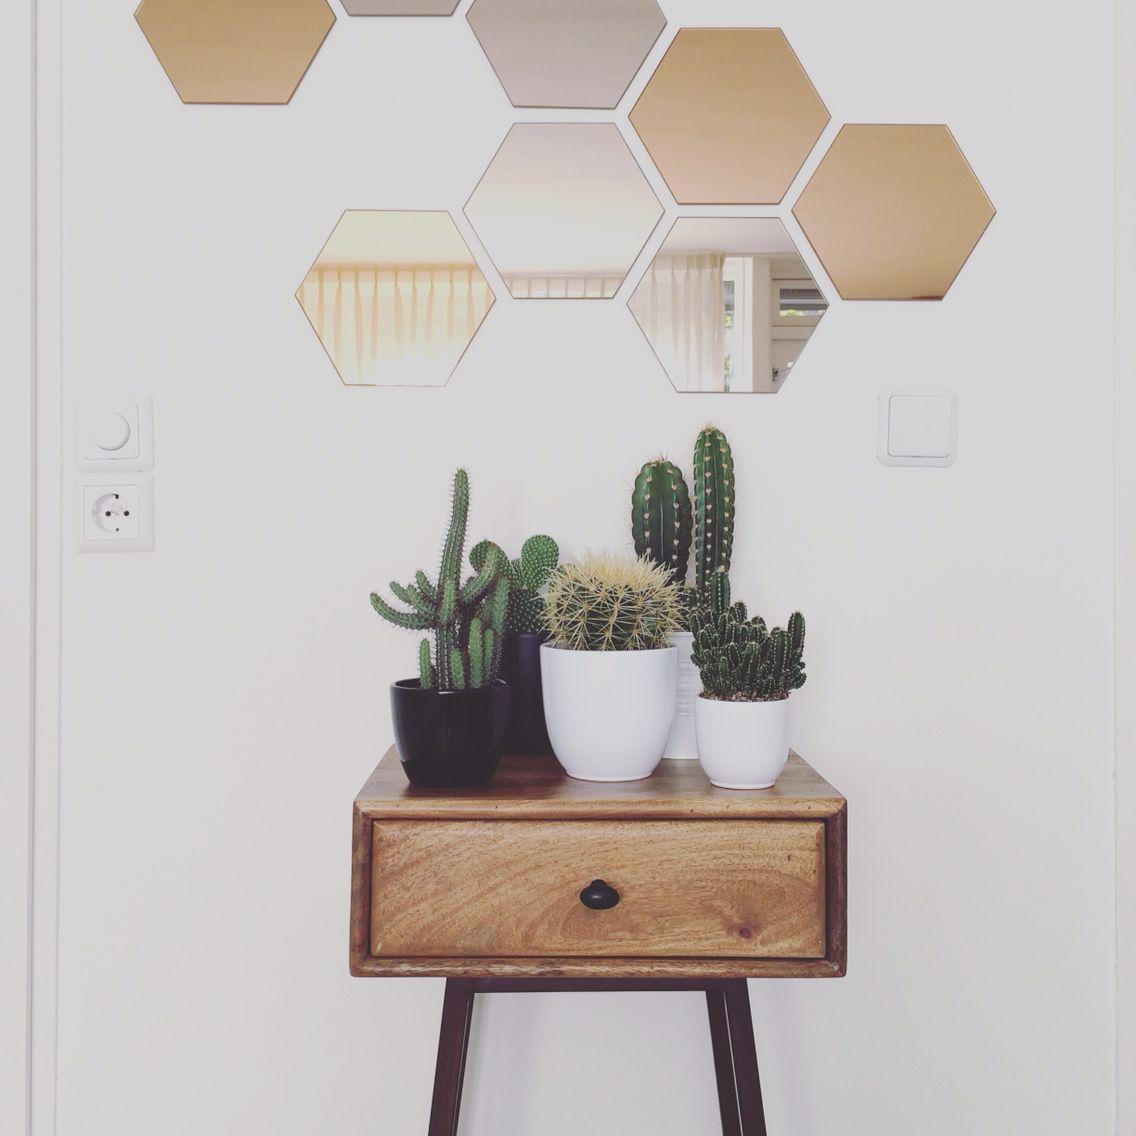 honefoss mirrors ikea skybox sidetable bepure dream home pinterest ambiance deco. Black Bedroom Furniture Sets. Home Design Ideas